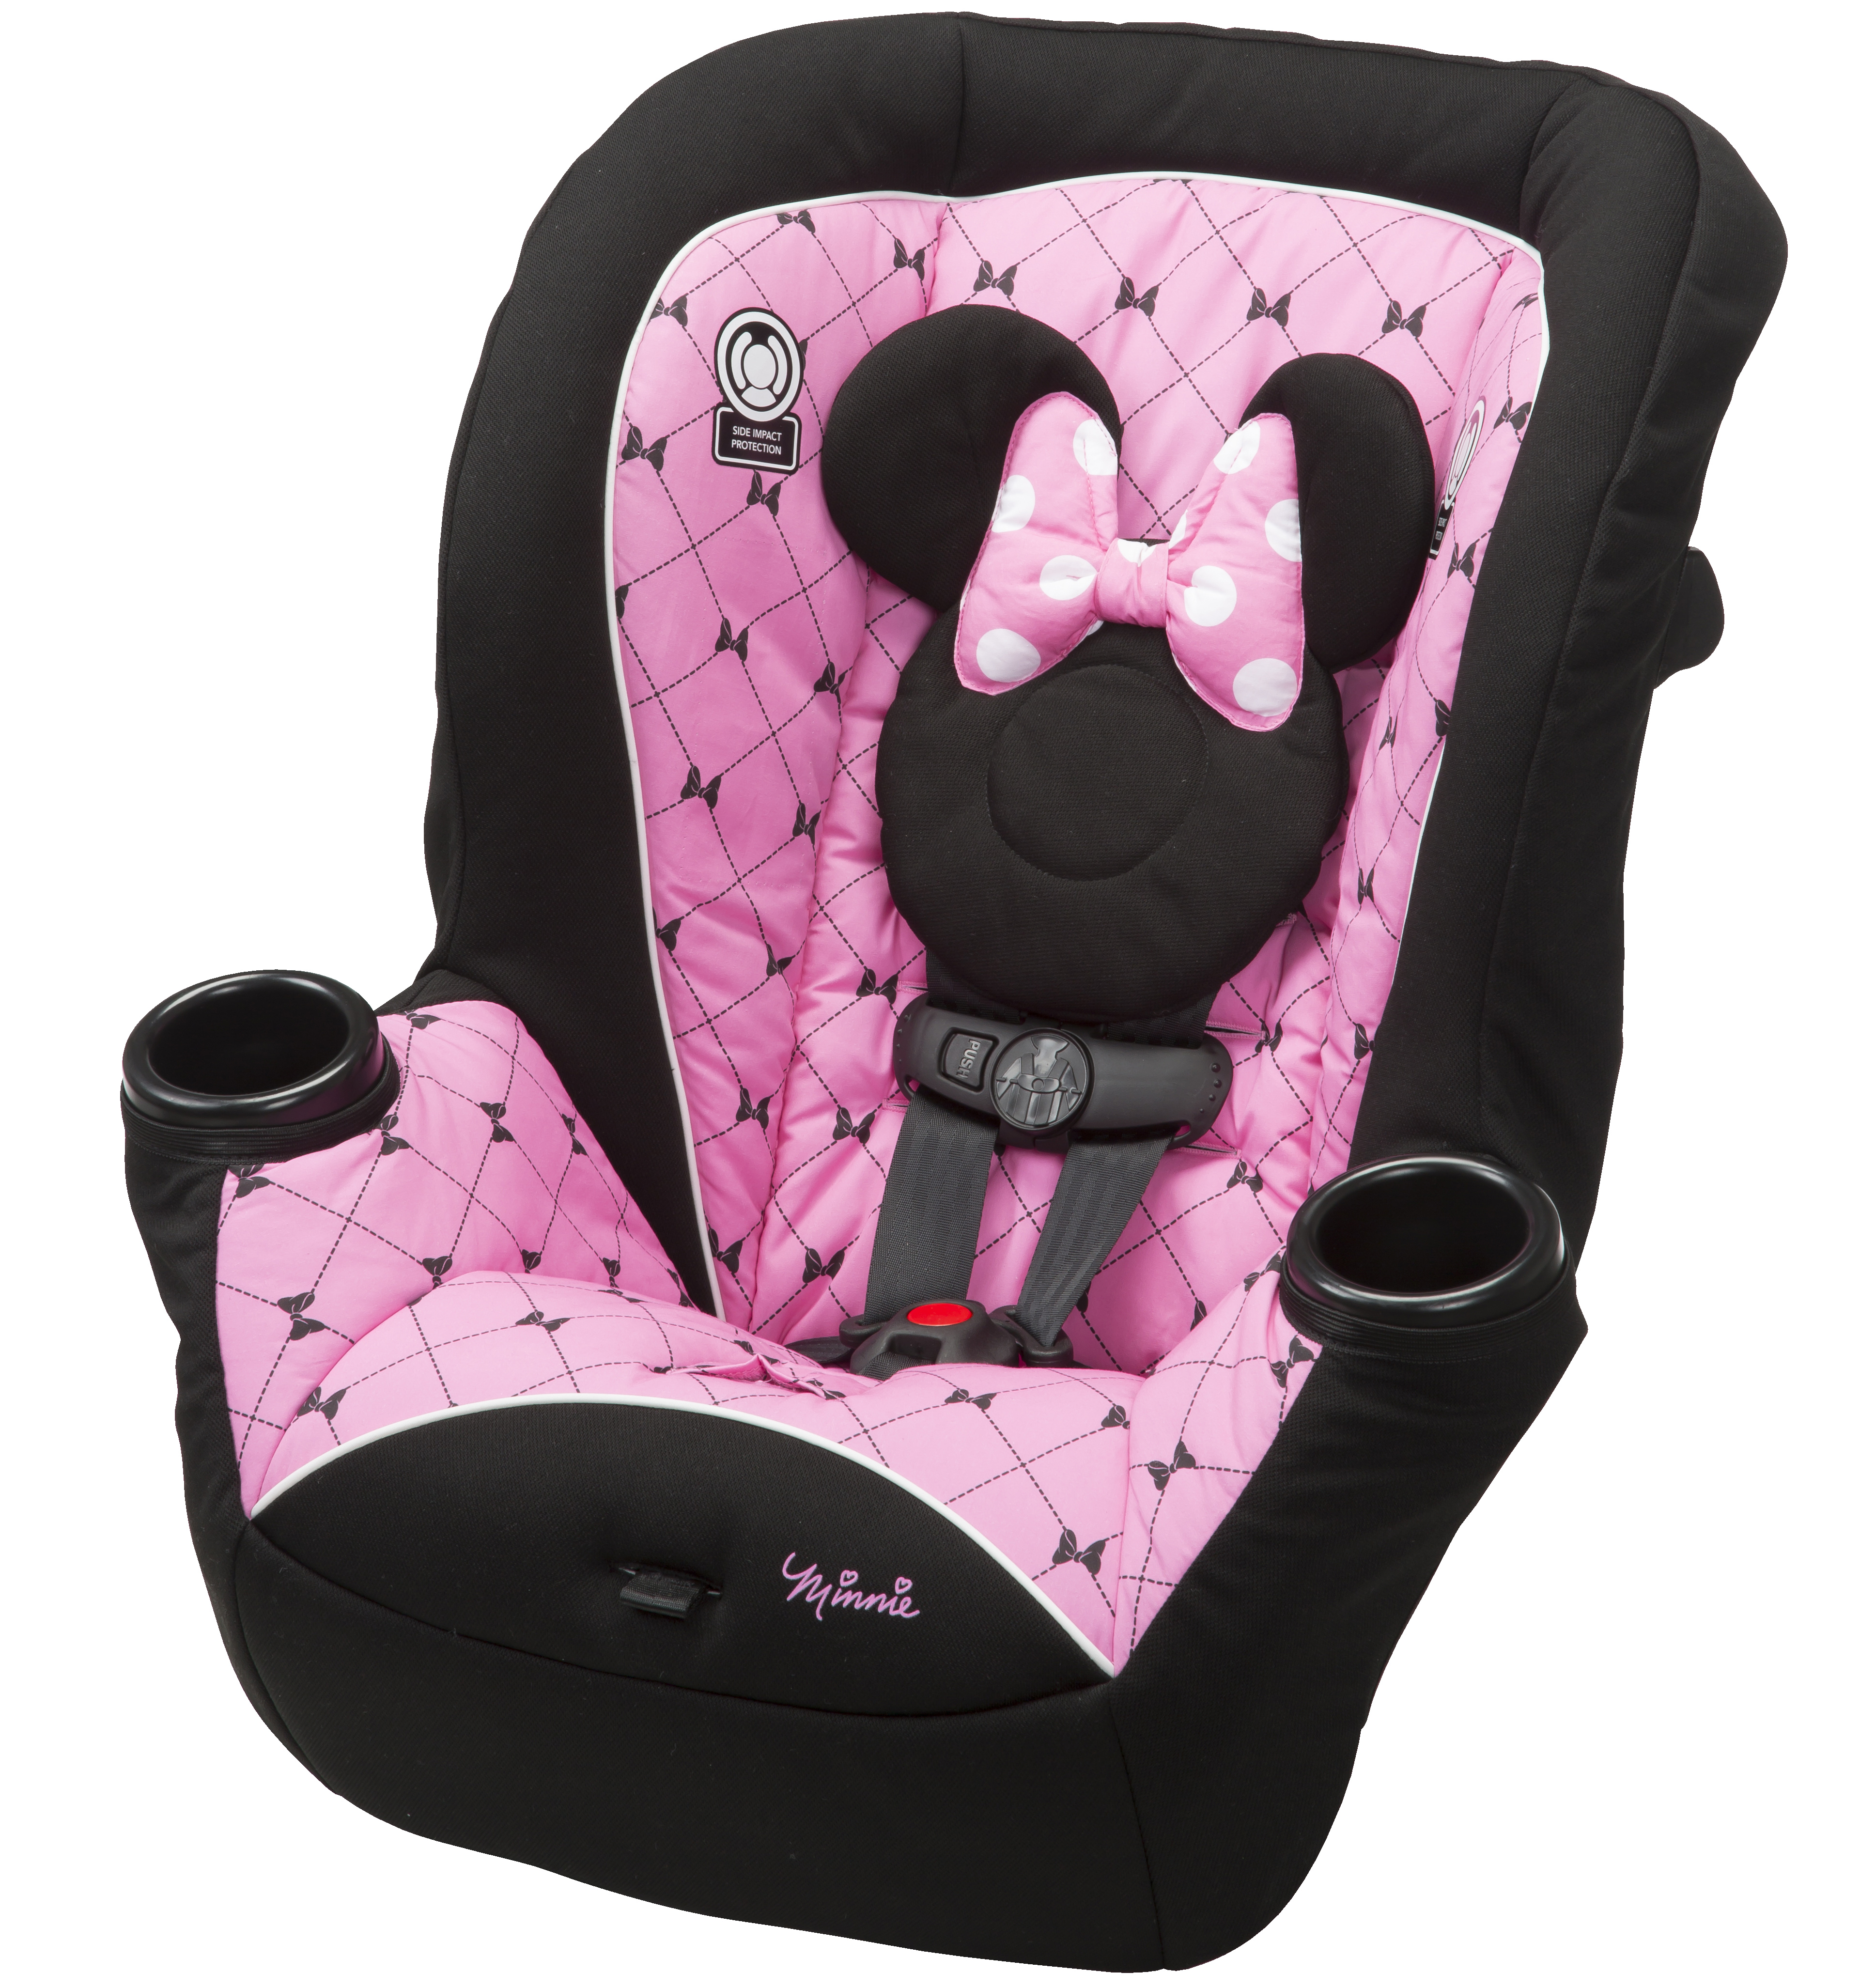 Disney APT 40 Convertible Car Seat - Kriss Kross Minnie PartNumber: 04927665000P KsnValue: 04927665000 MfgPartNumber: CC118EET